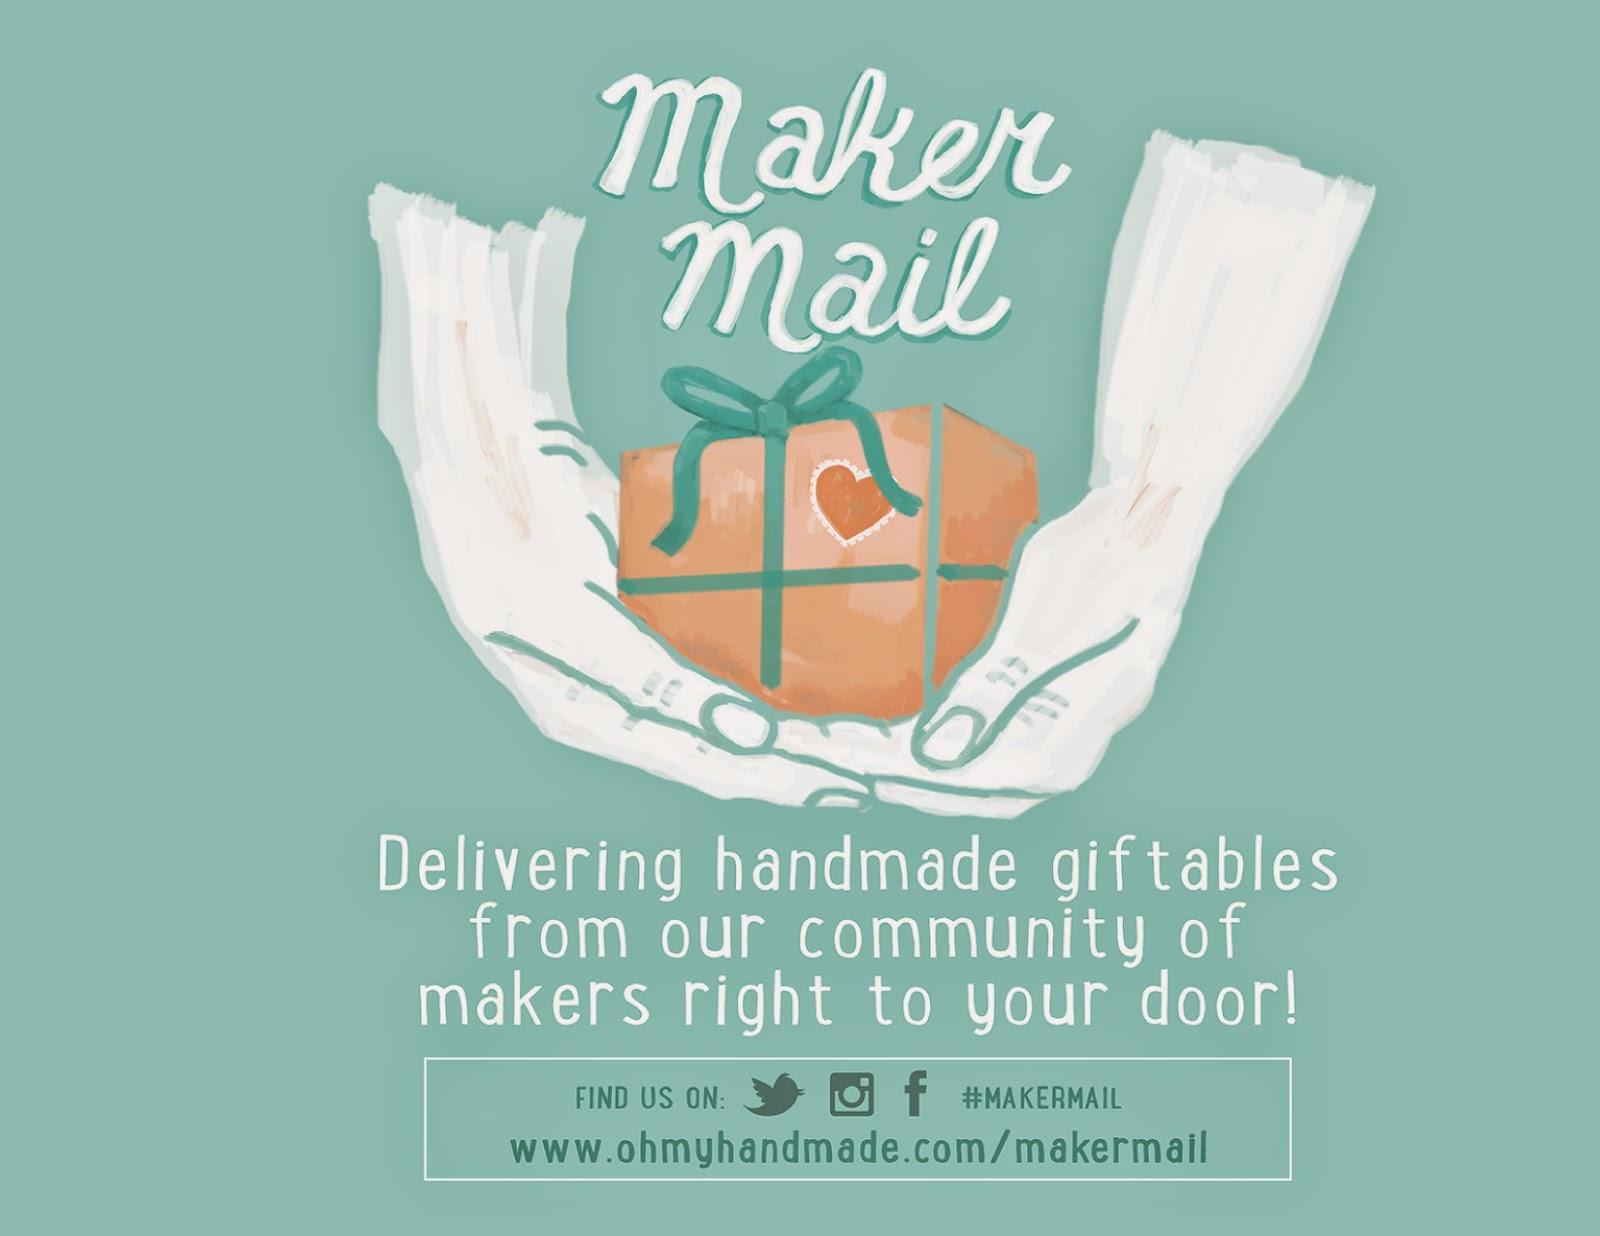 http://ohmyhandmade.com/makermail/